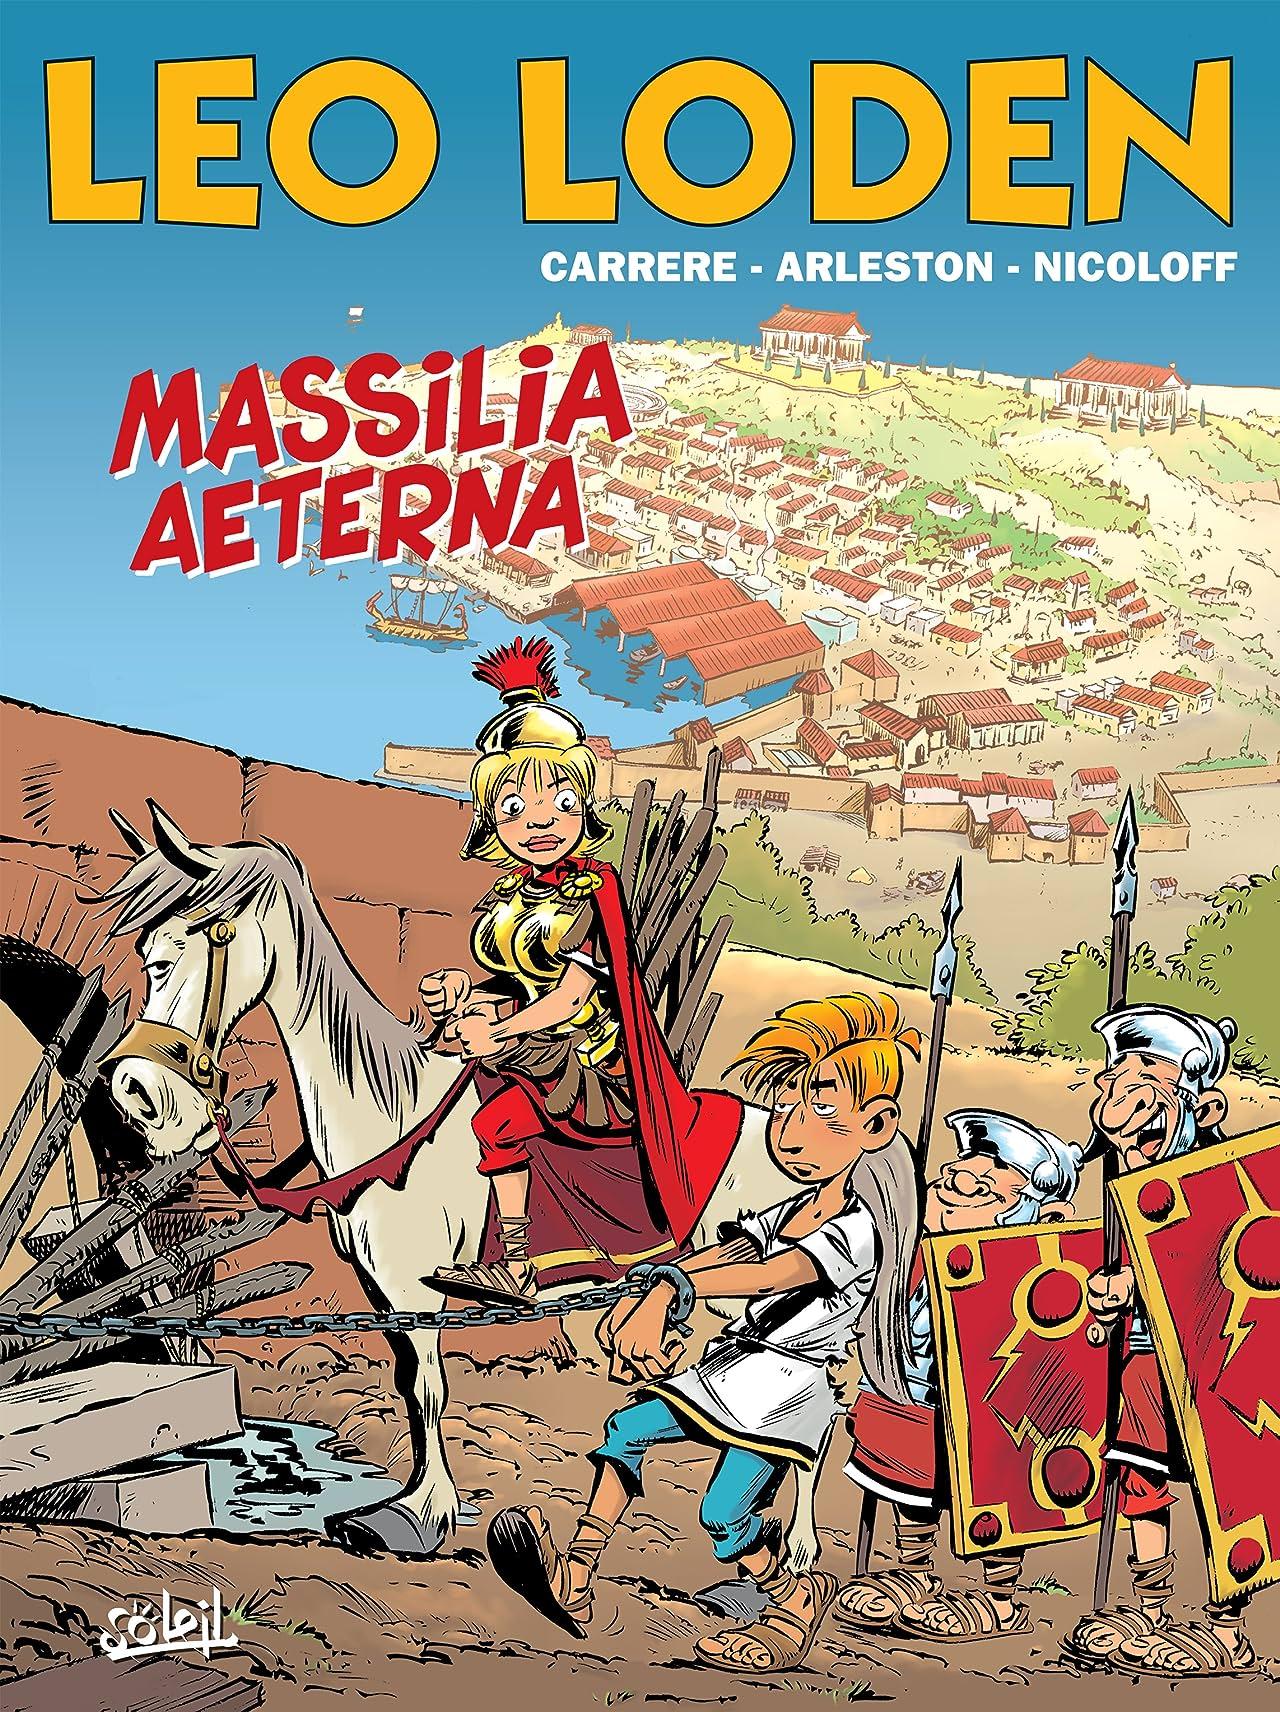 Léo Loden Vol. 25: Massilia Aeterna